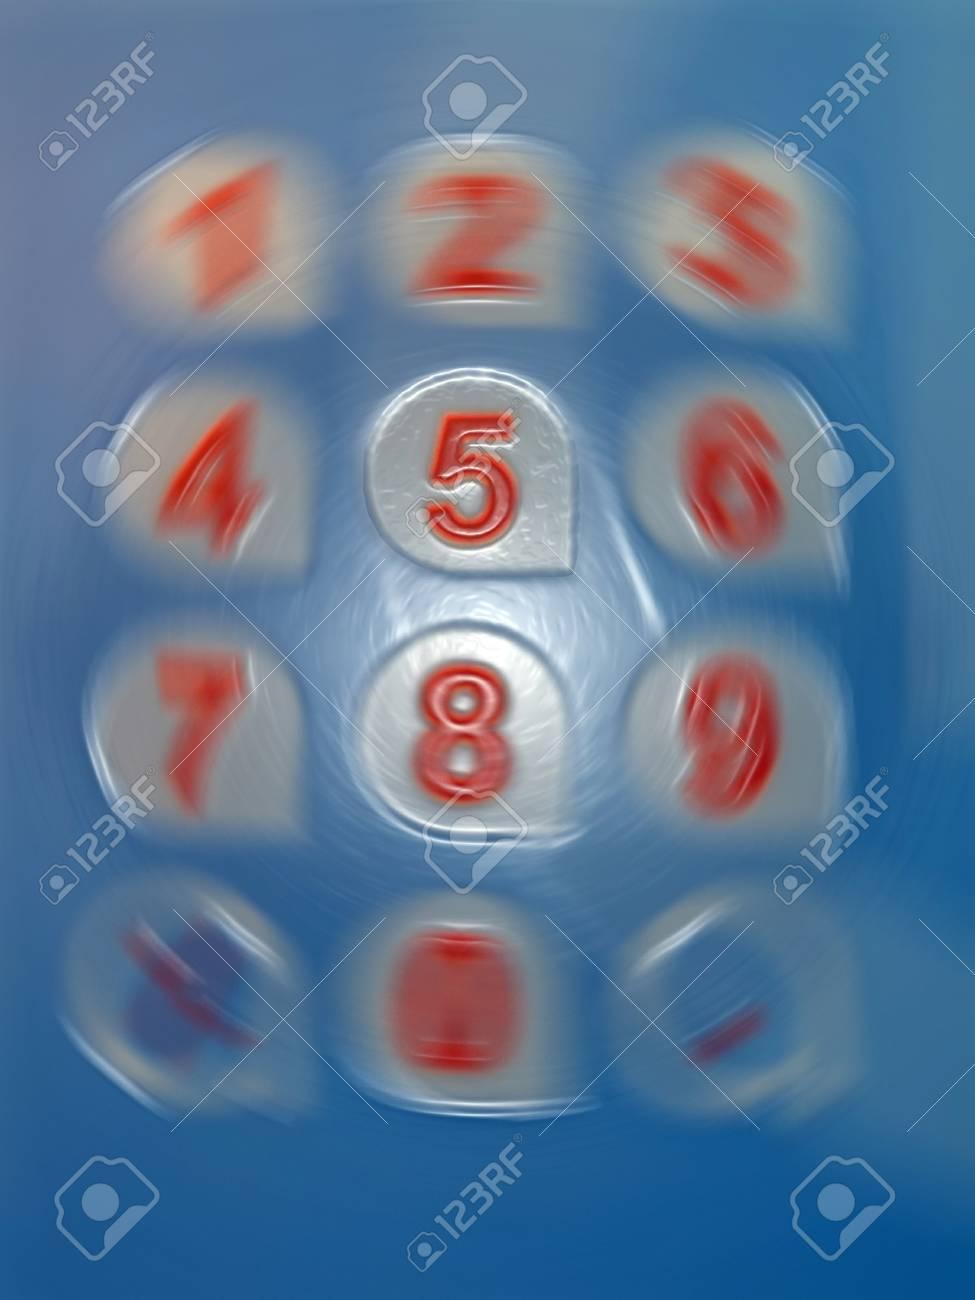 five number rotation, modern digital hurricane details Stock Photo - 12370831